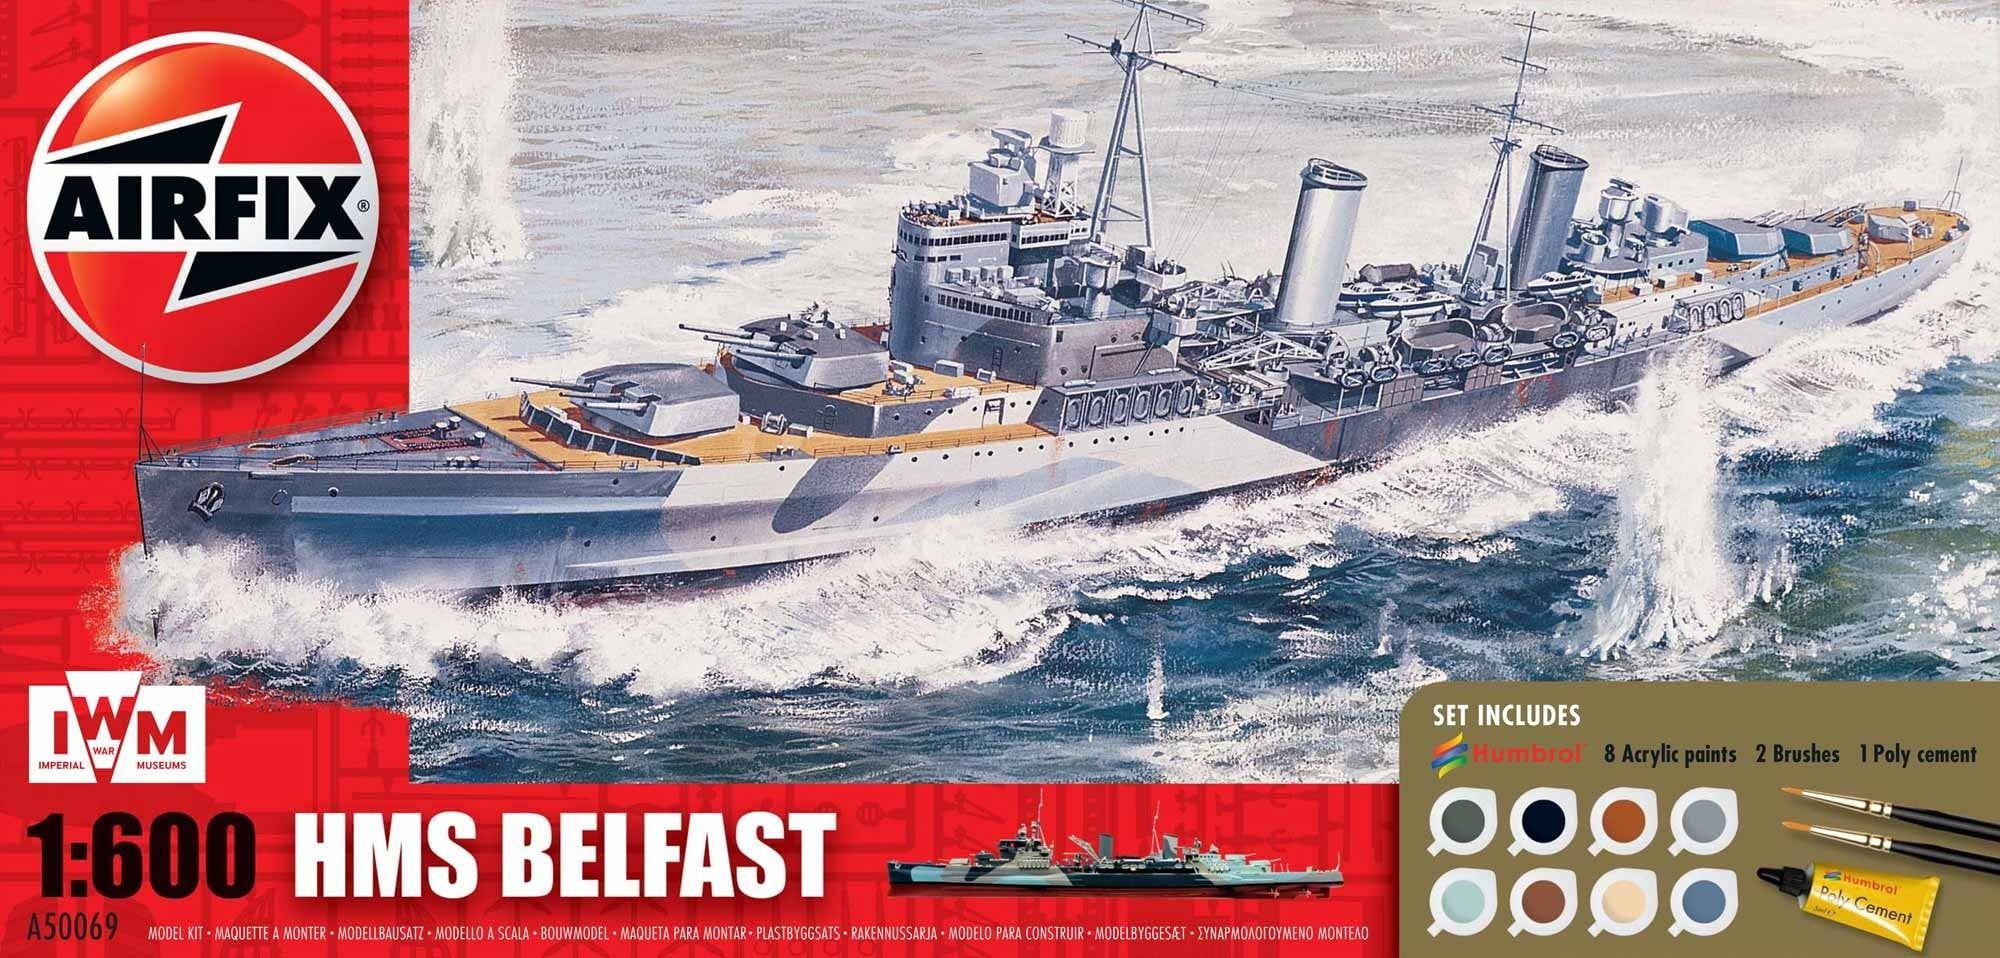 Airfix HMS Belfast Gift Set